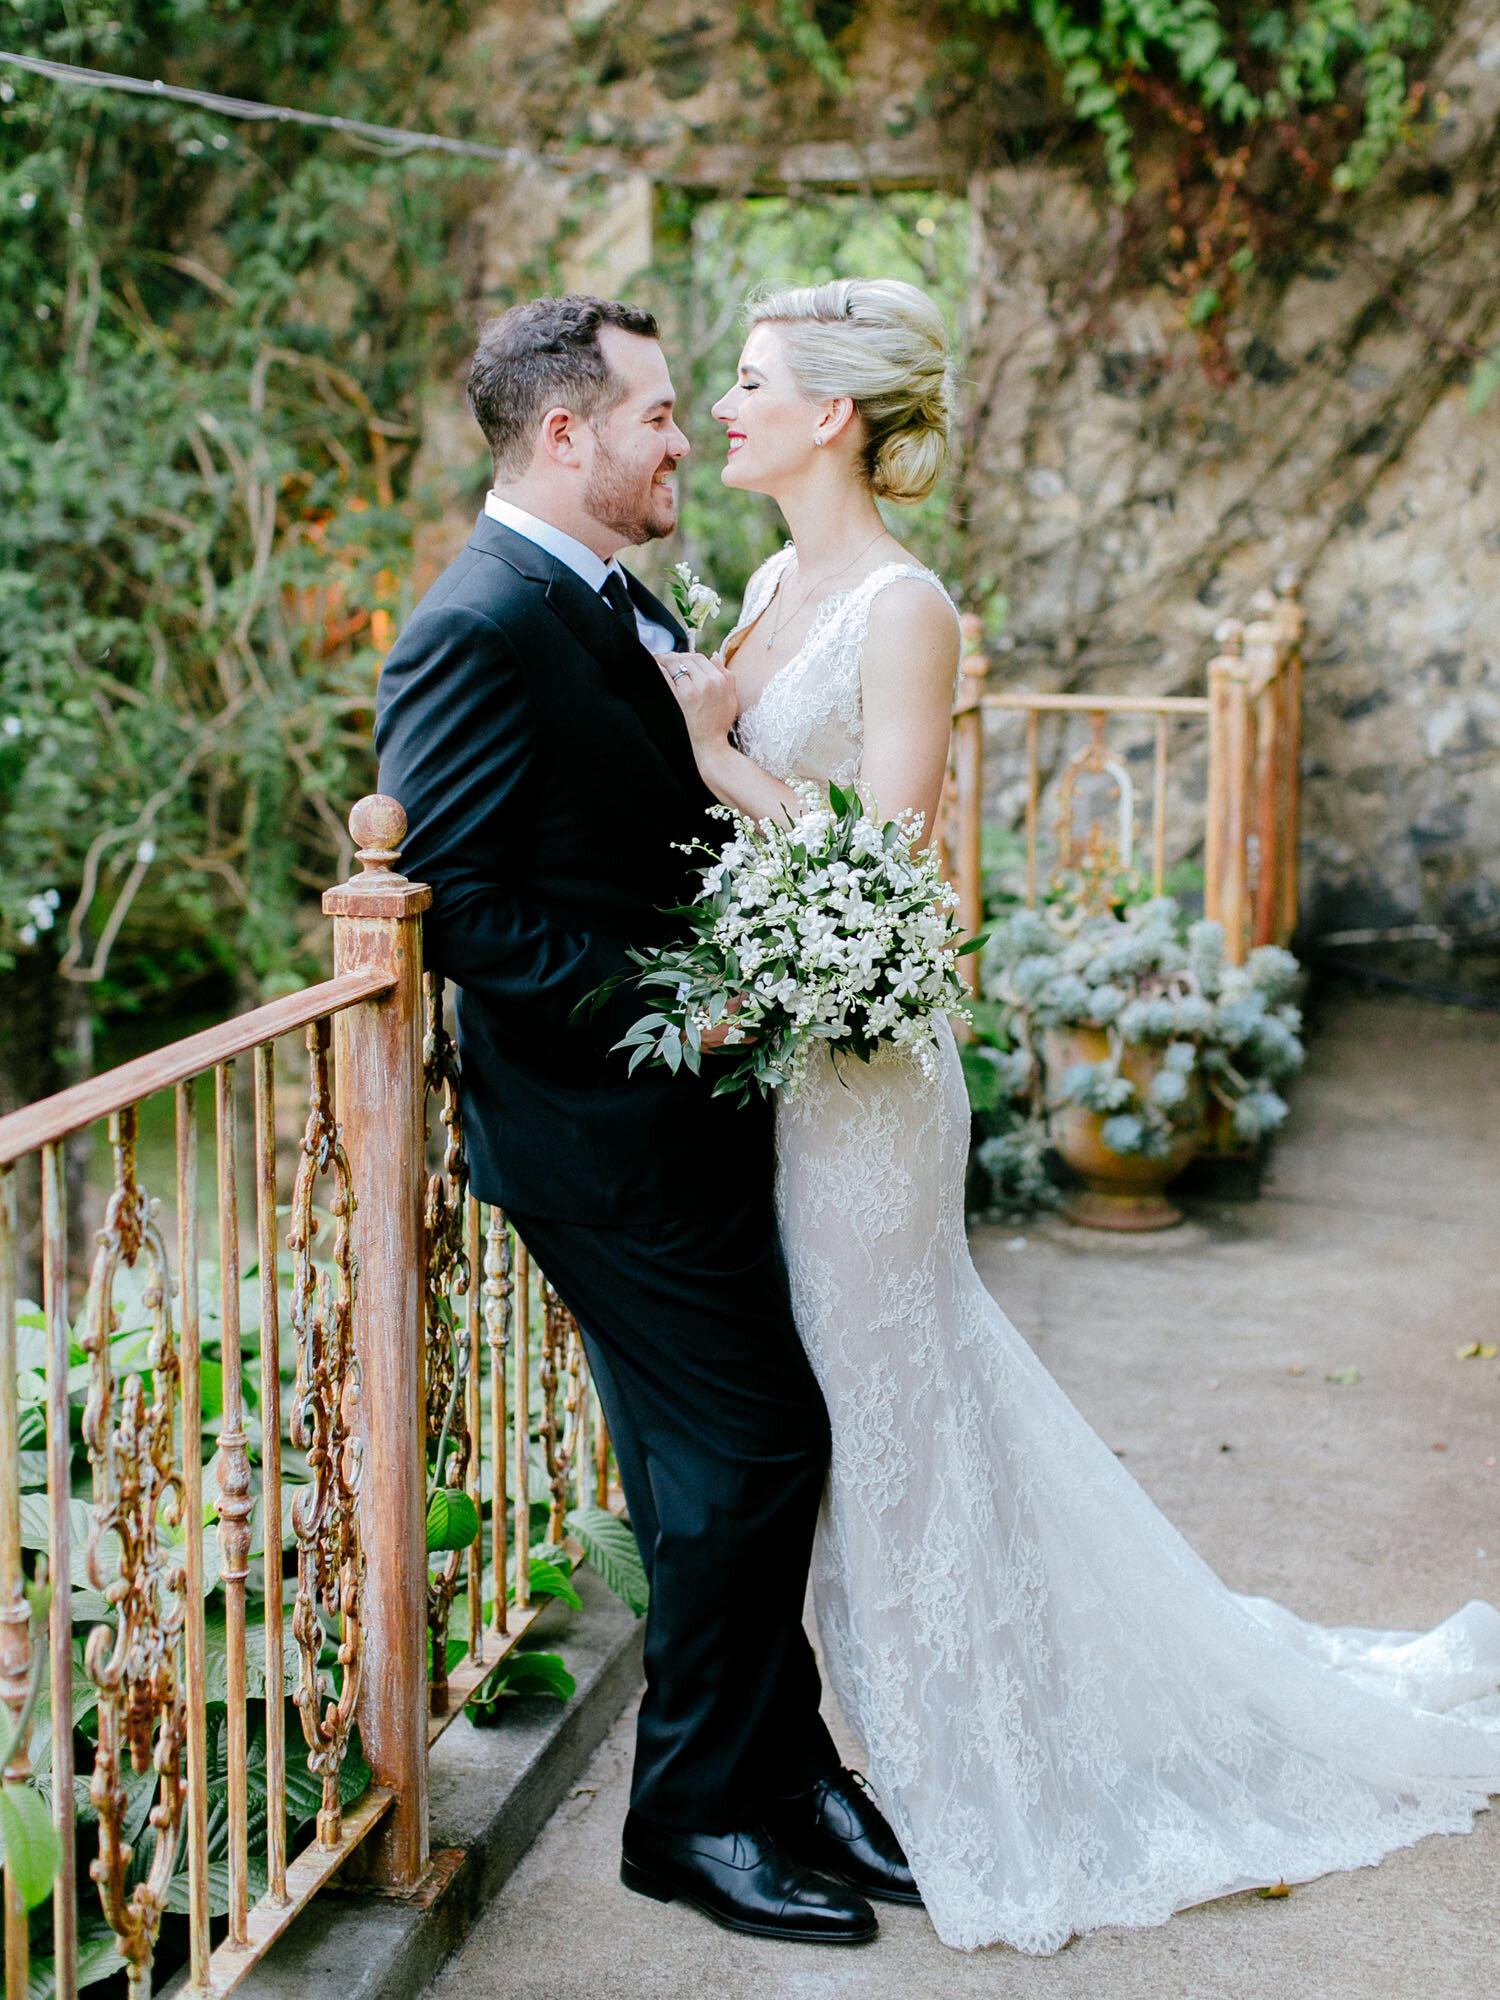 Chris-J-Evans-Maui-Wedding-Kim&Brian3613.jpg